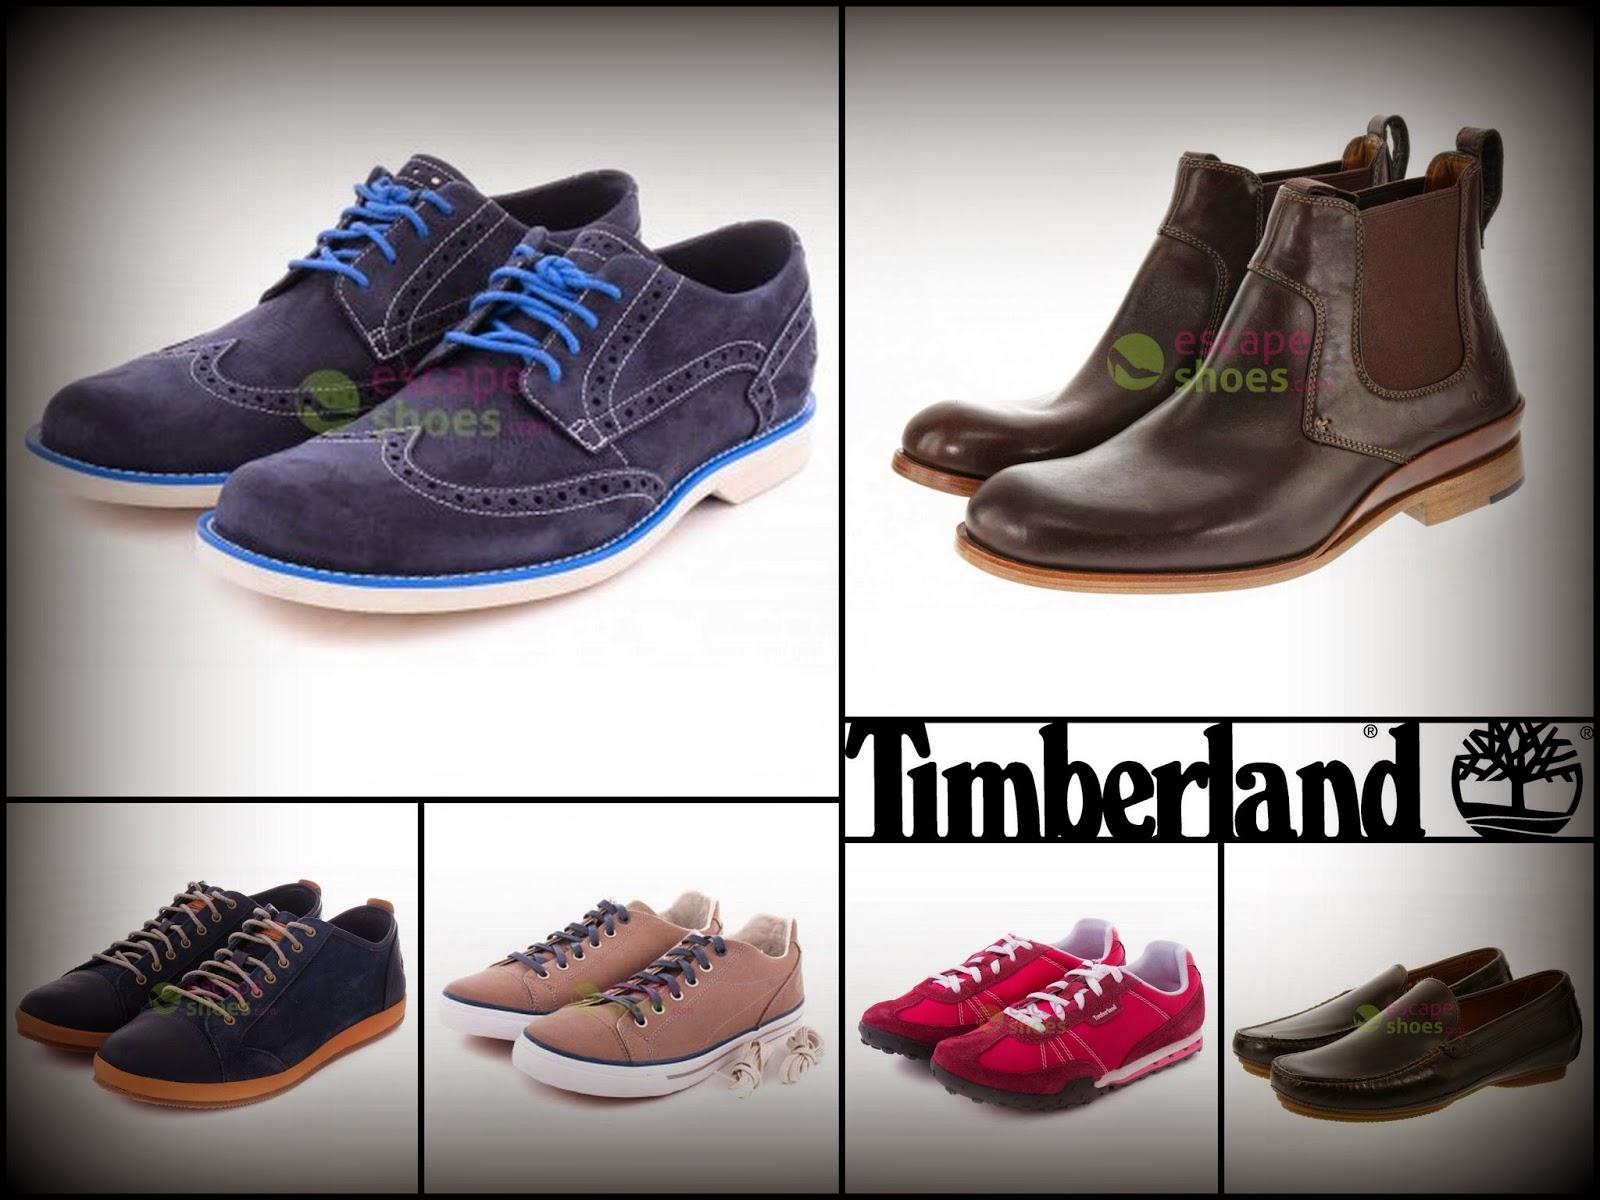 Amazon Timberland Zapatos y complementos - fotos de zapatos timberland